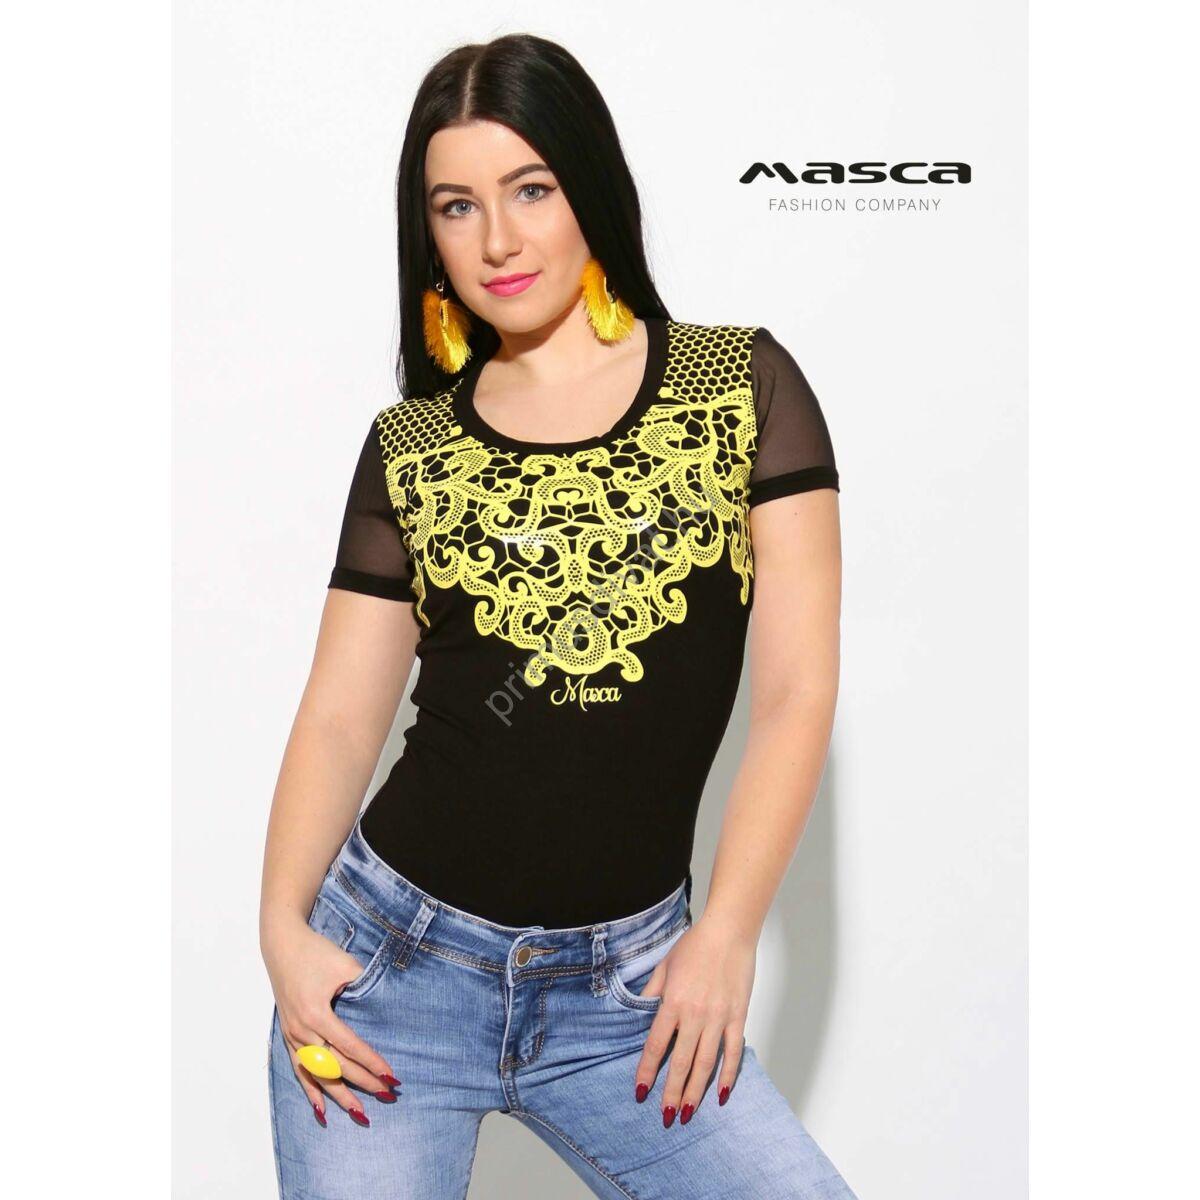 Masca Fashion rugalmas necc rövid ujjú fekete felső citromsárga ... 8b2cfbf506